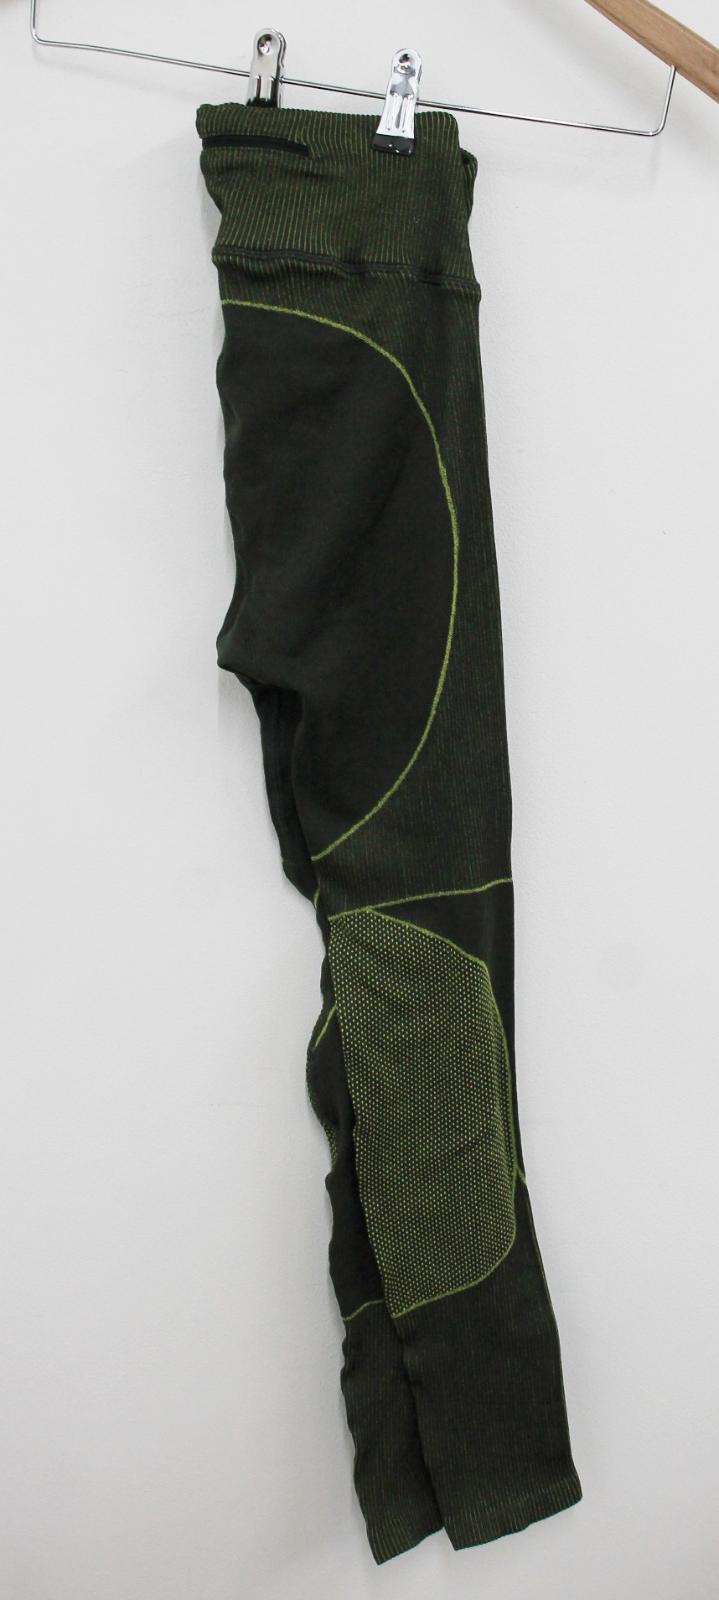 Sweaty-Betty-senoras-Neon-Verde-Amarillo-Elastico-Cintura-Alta-Leggings-S-W24-L24 miniatura 6